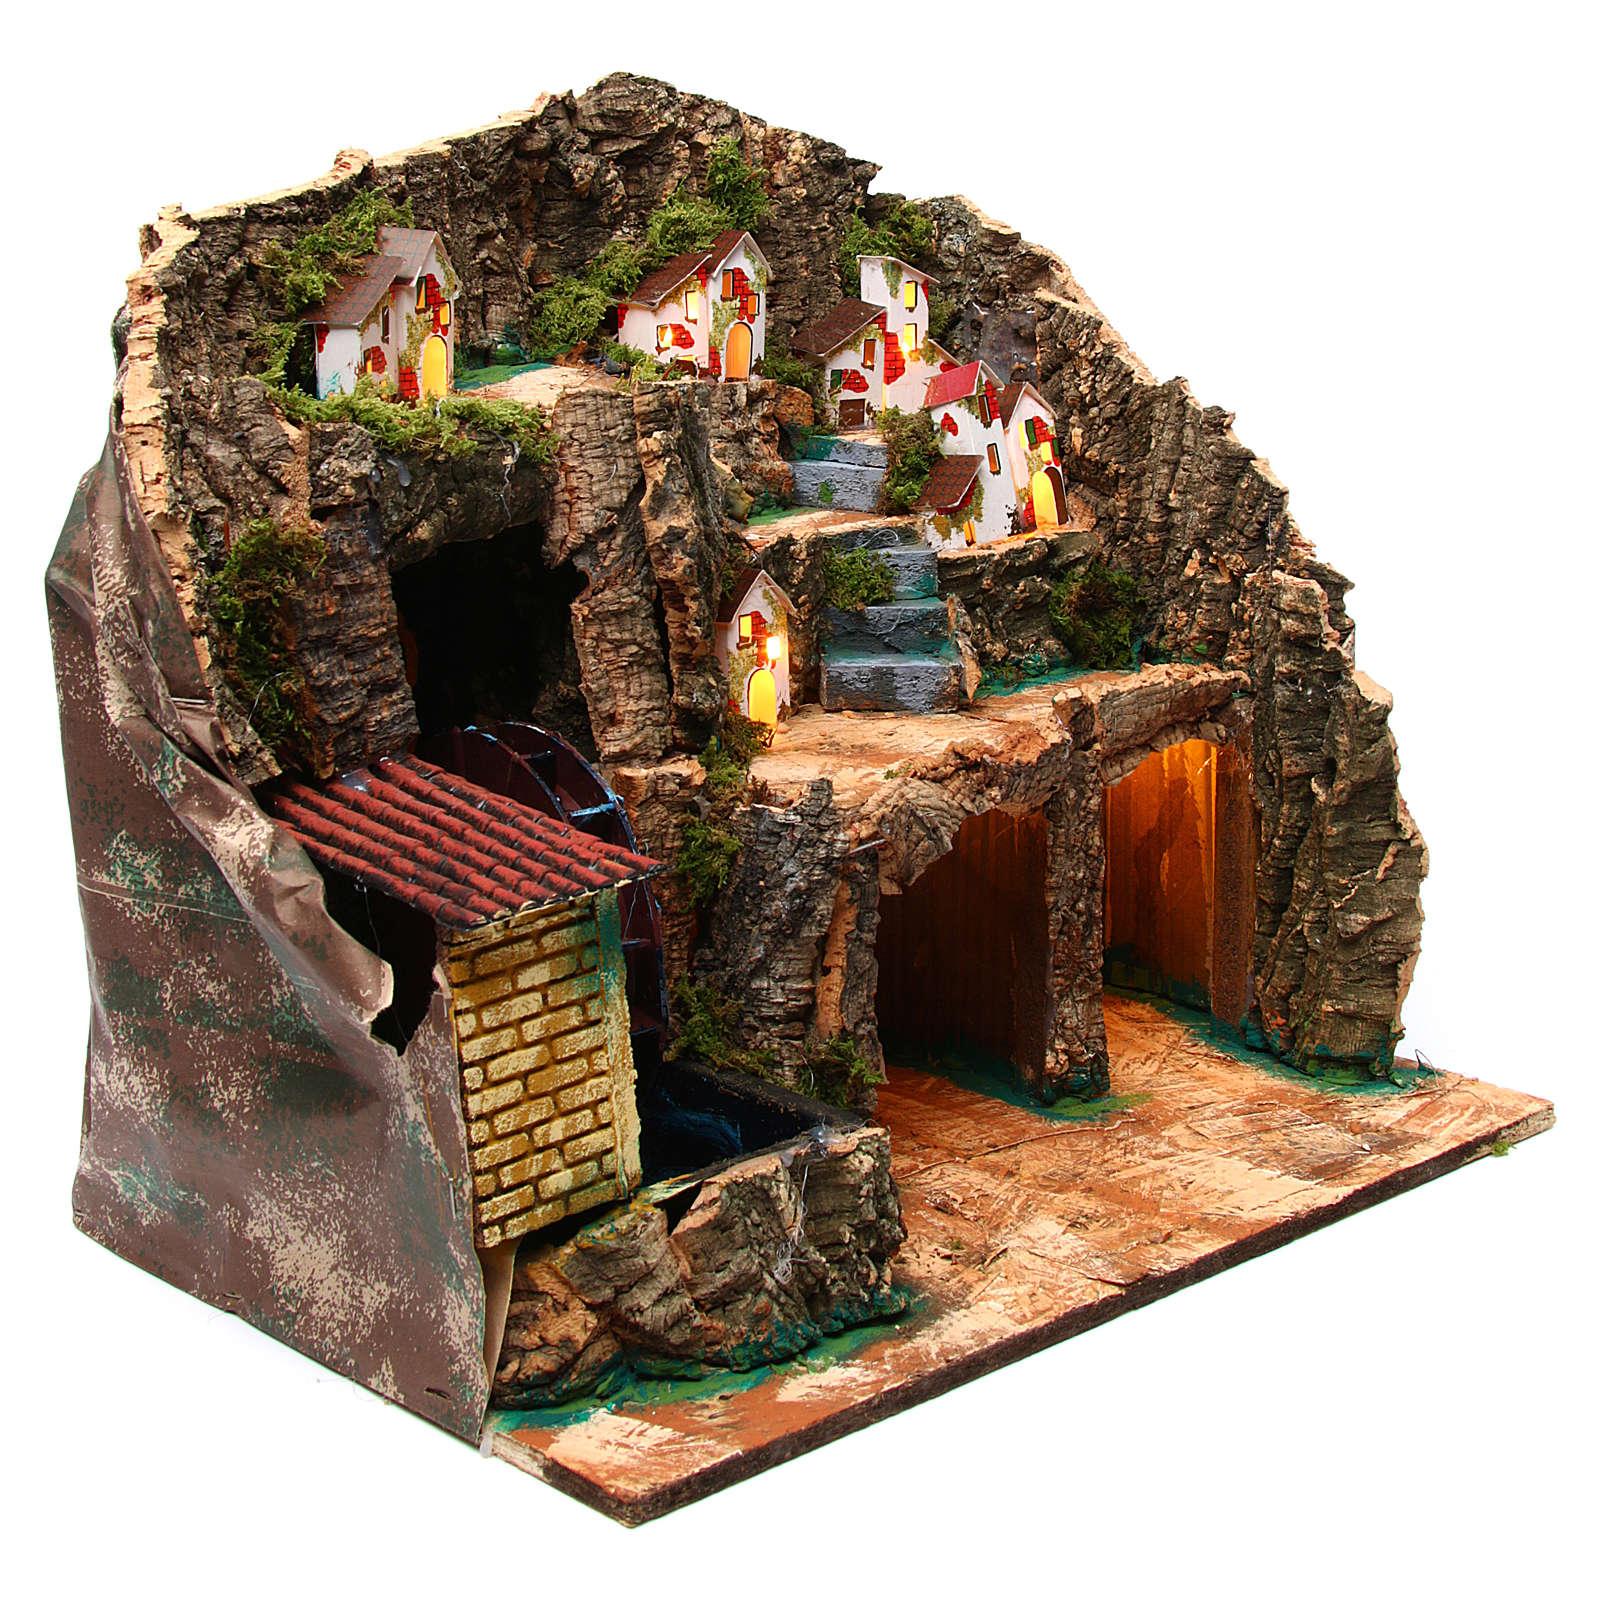 Nativity scene setting with watermill 45x30x35 cm 4